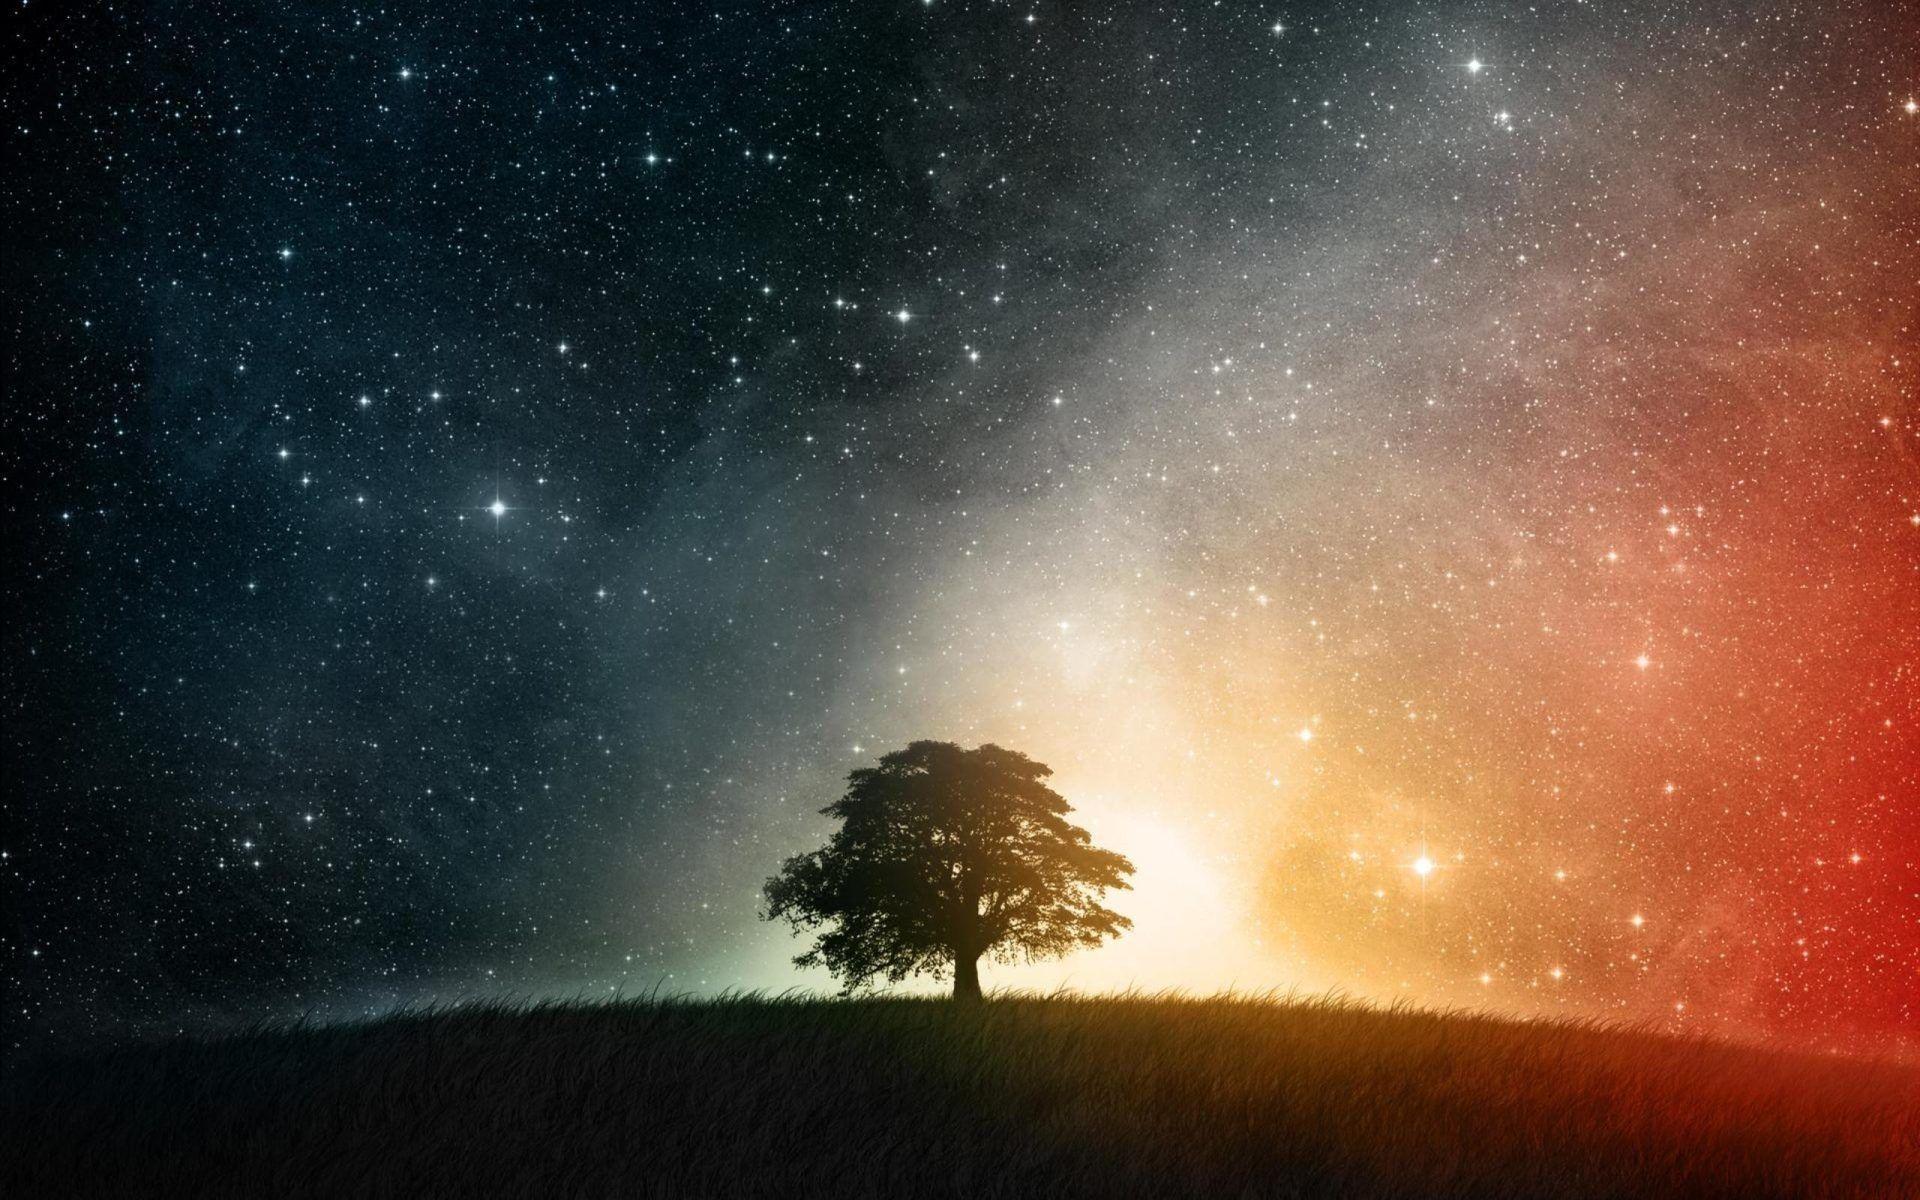 star sky wallpapers 1080p for desktop wallpaper background